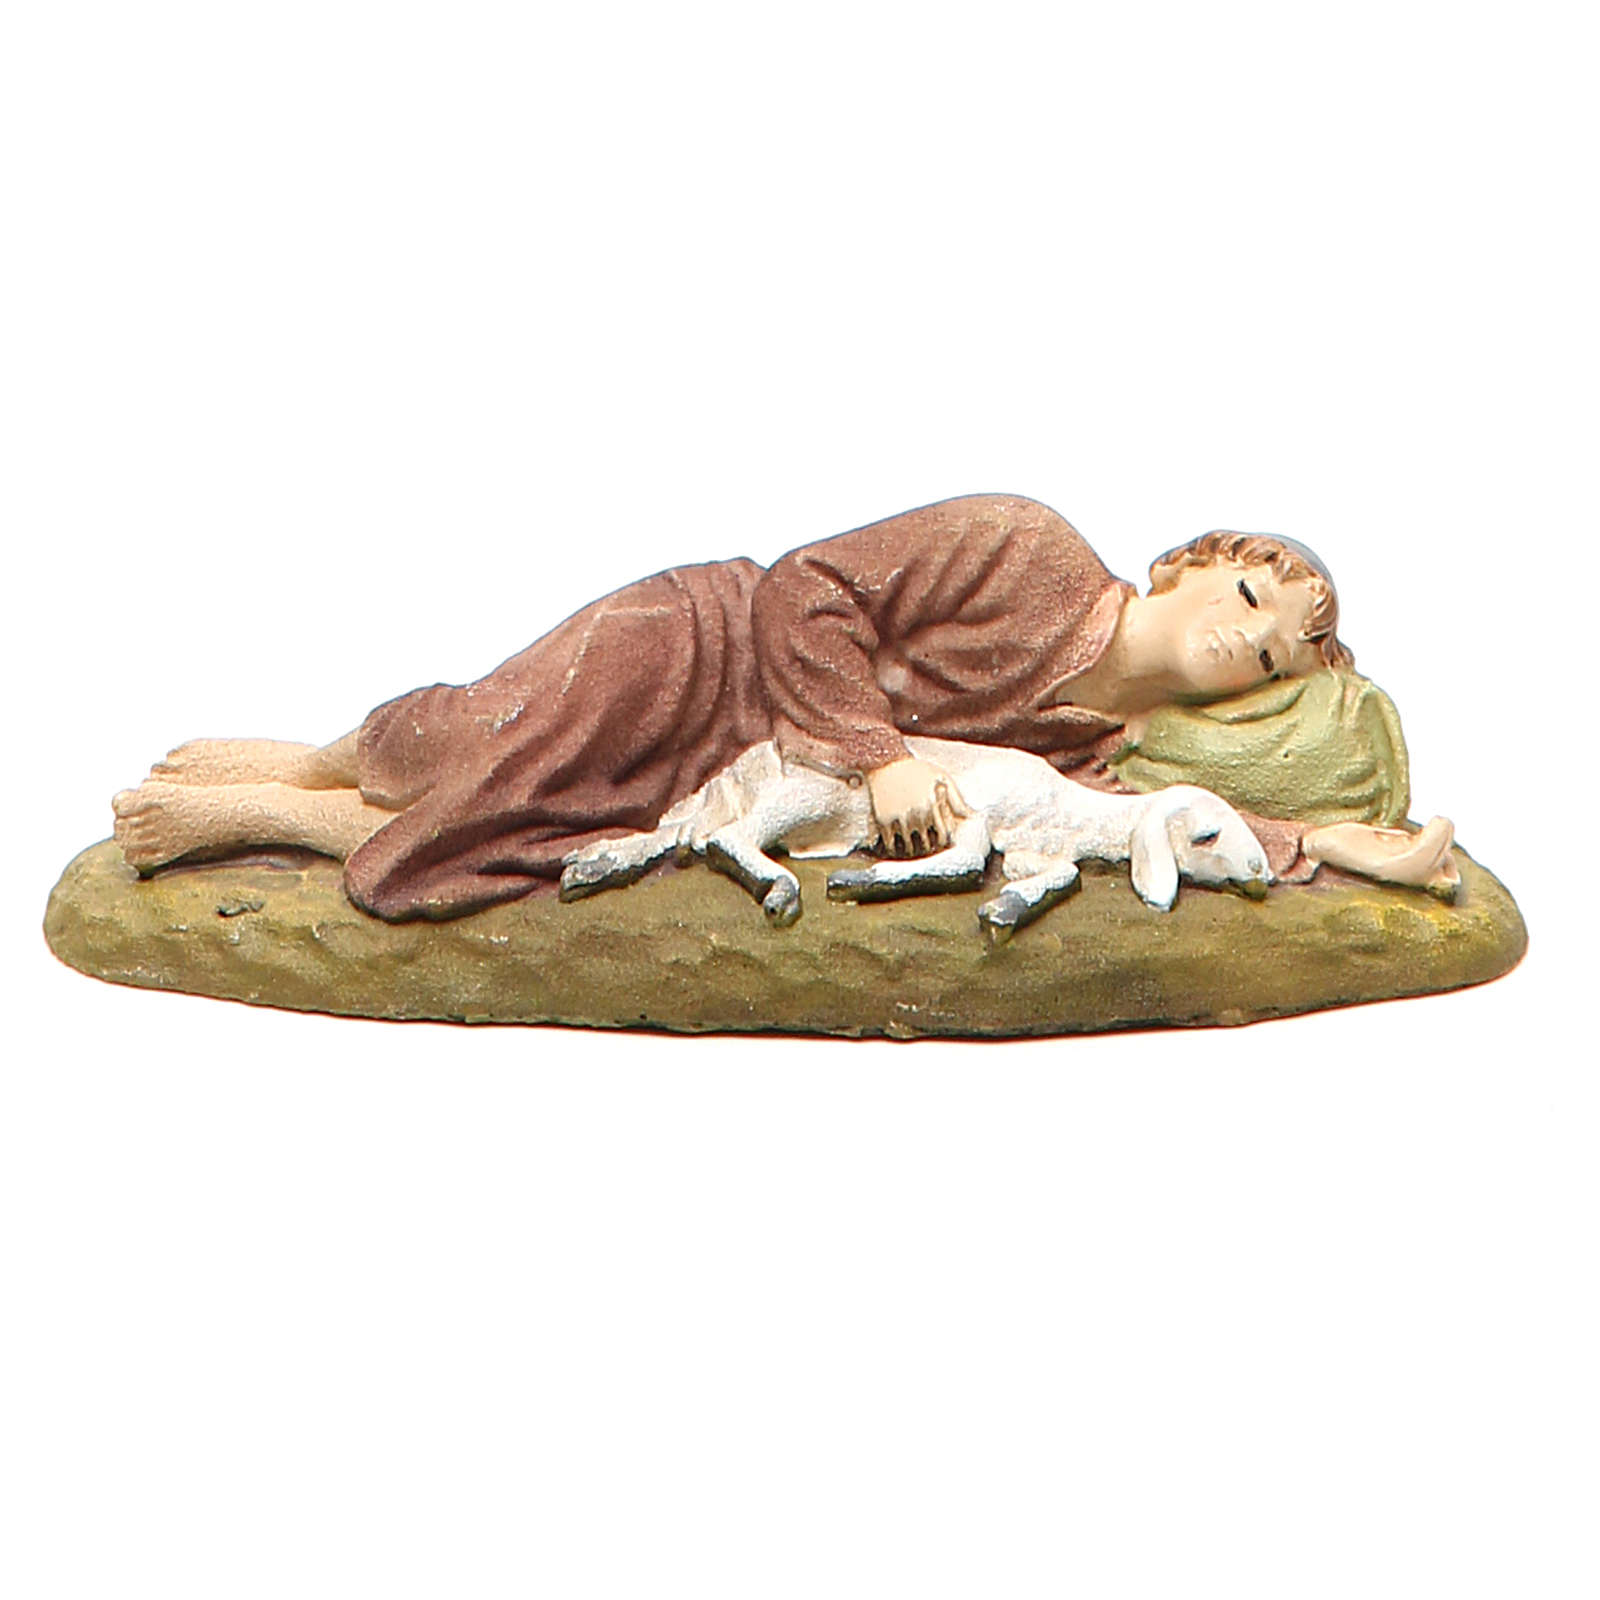 Sleeping shepherd in painted resin 10cm Landi Collection 3